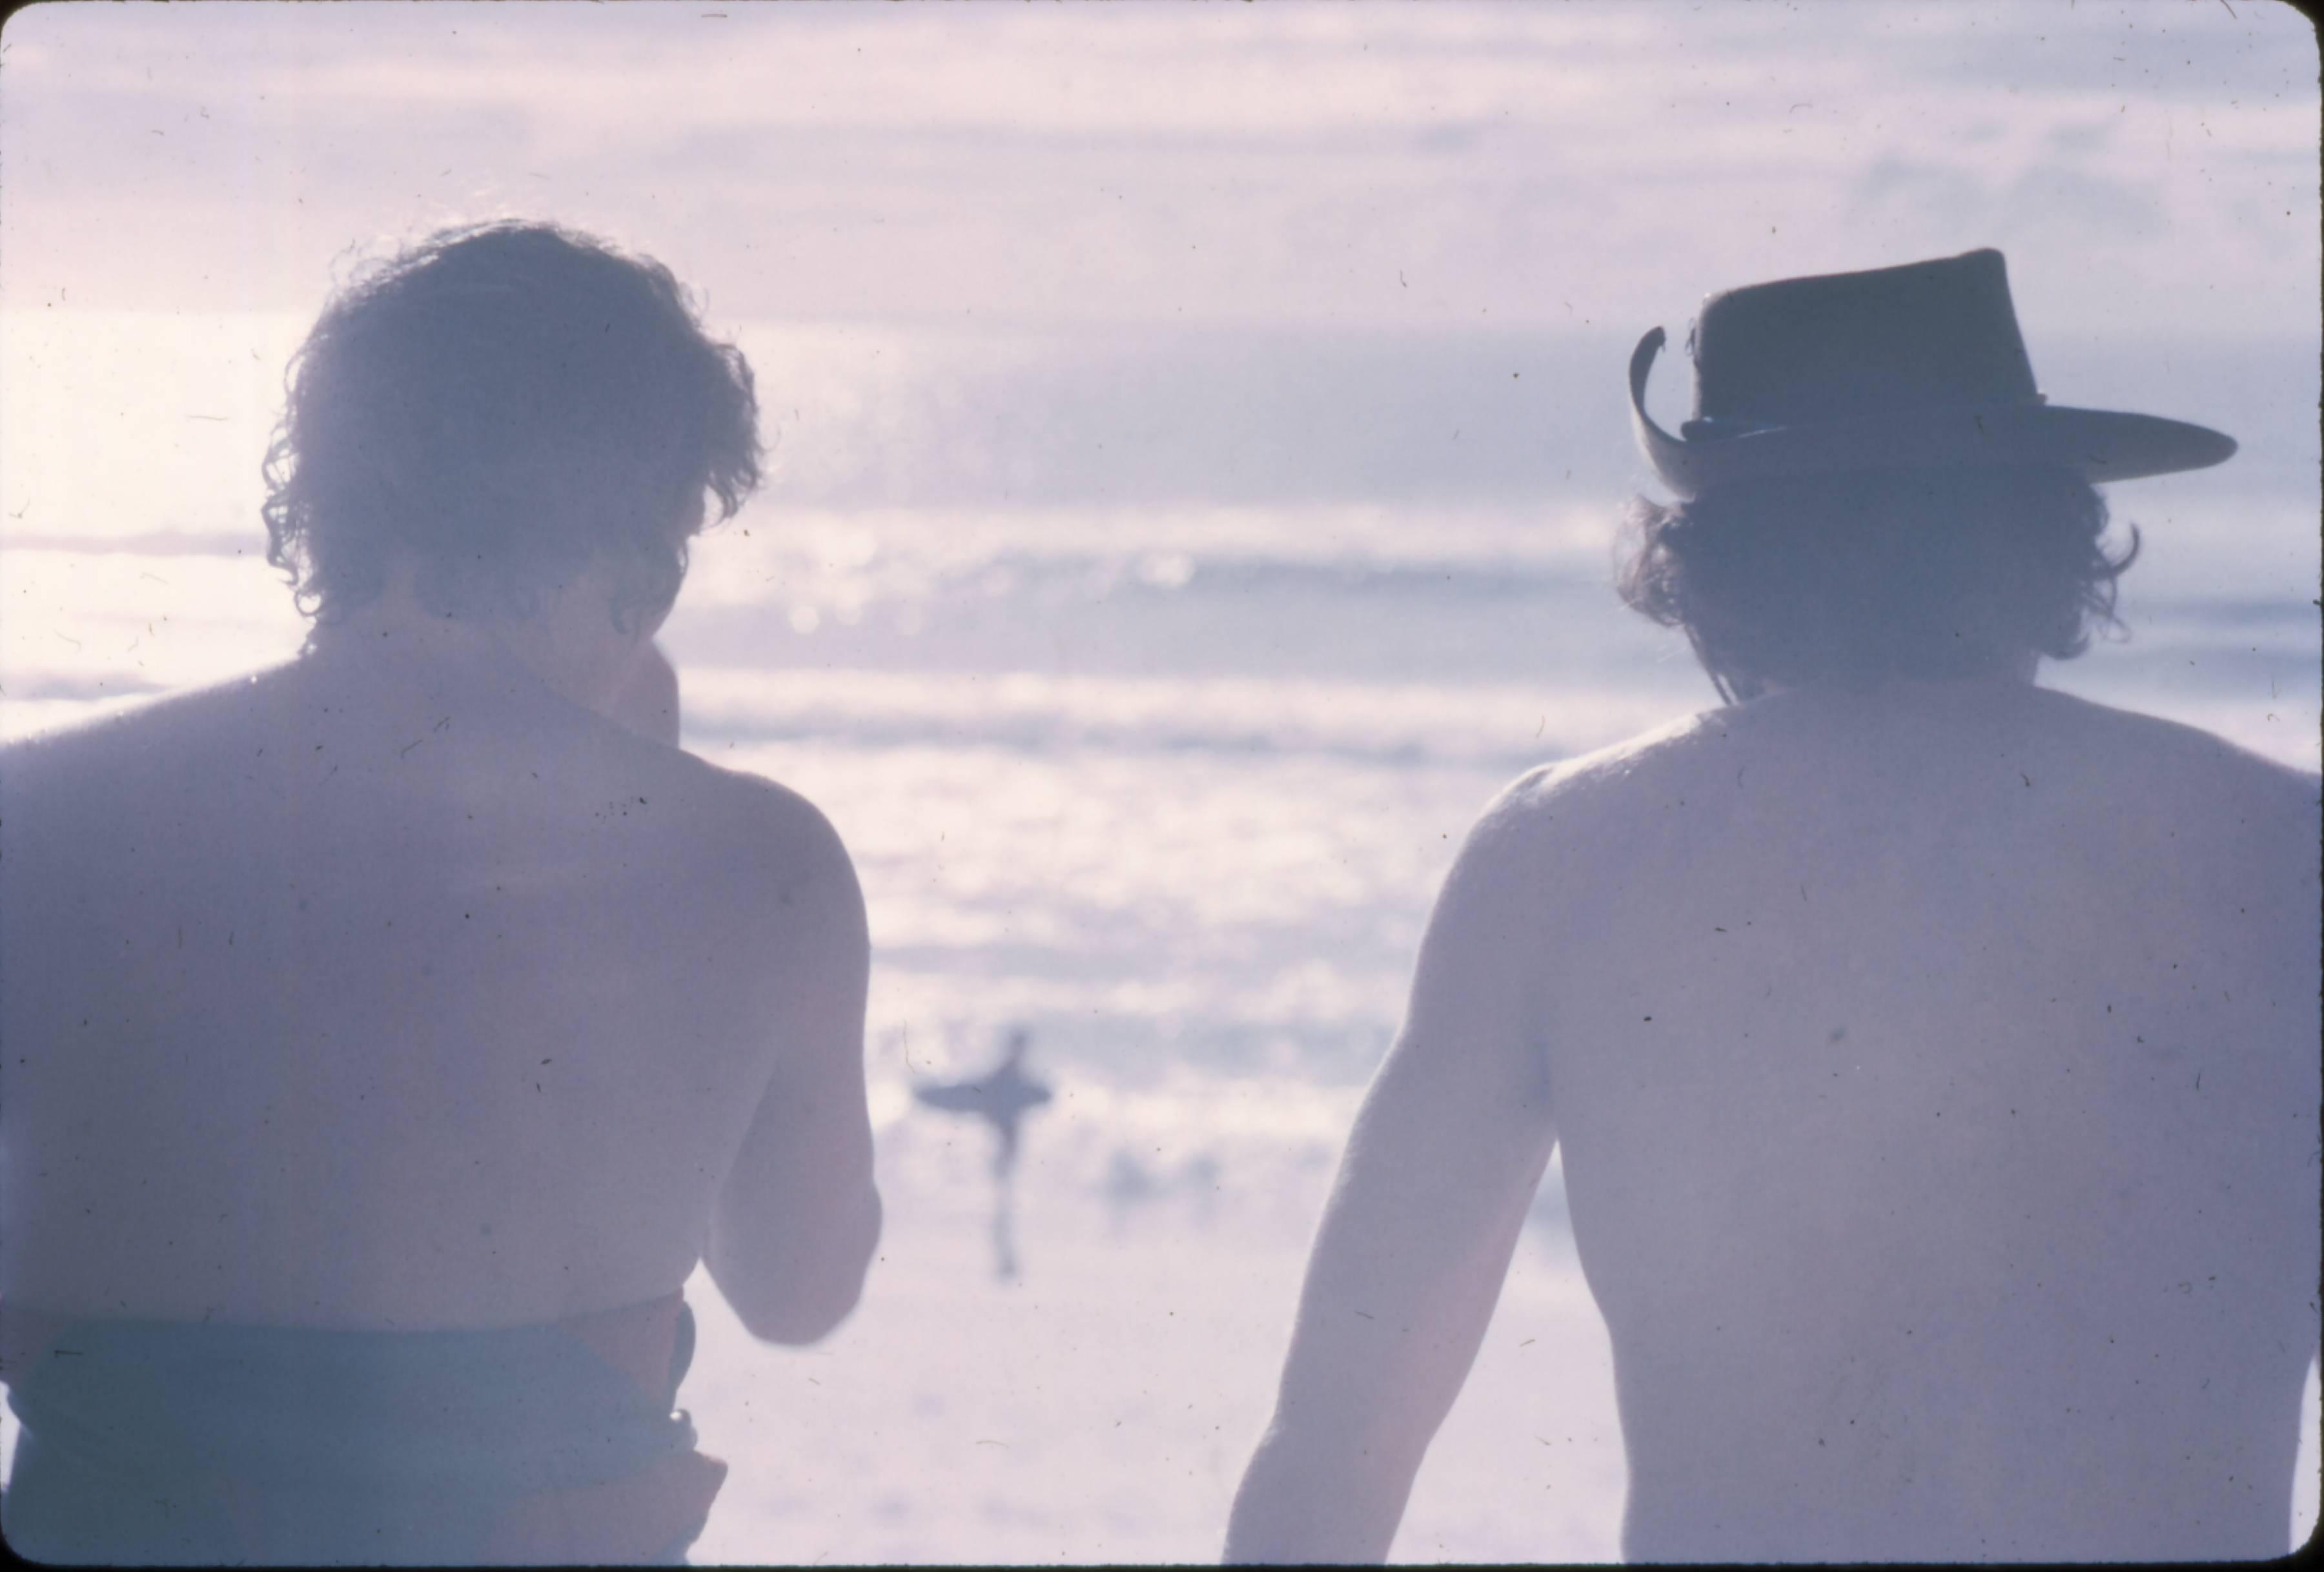 23_Surfers paradise_Slide10028